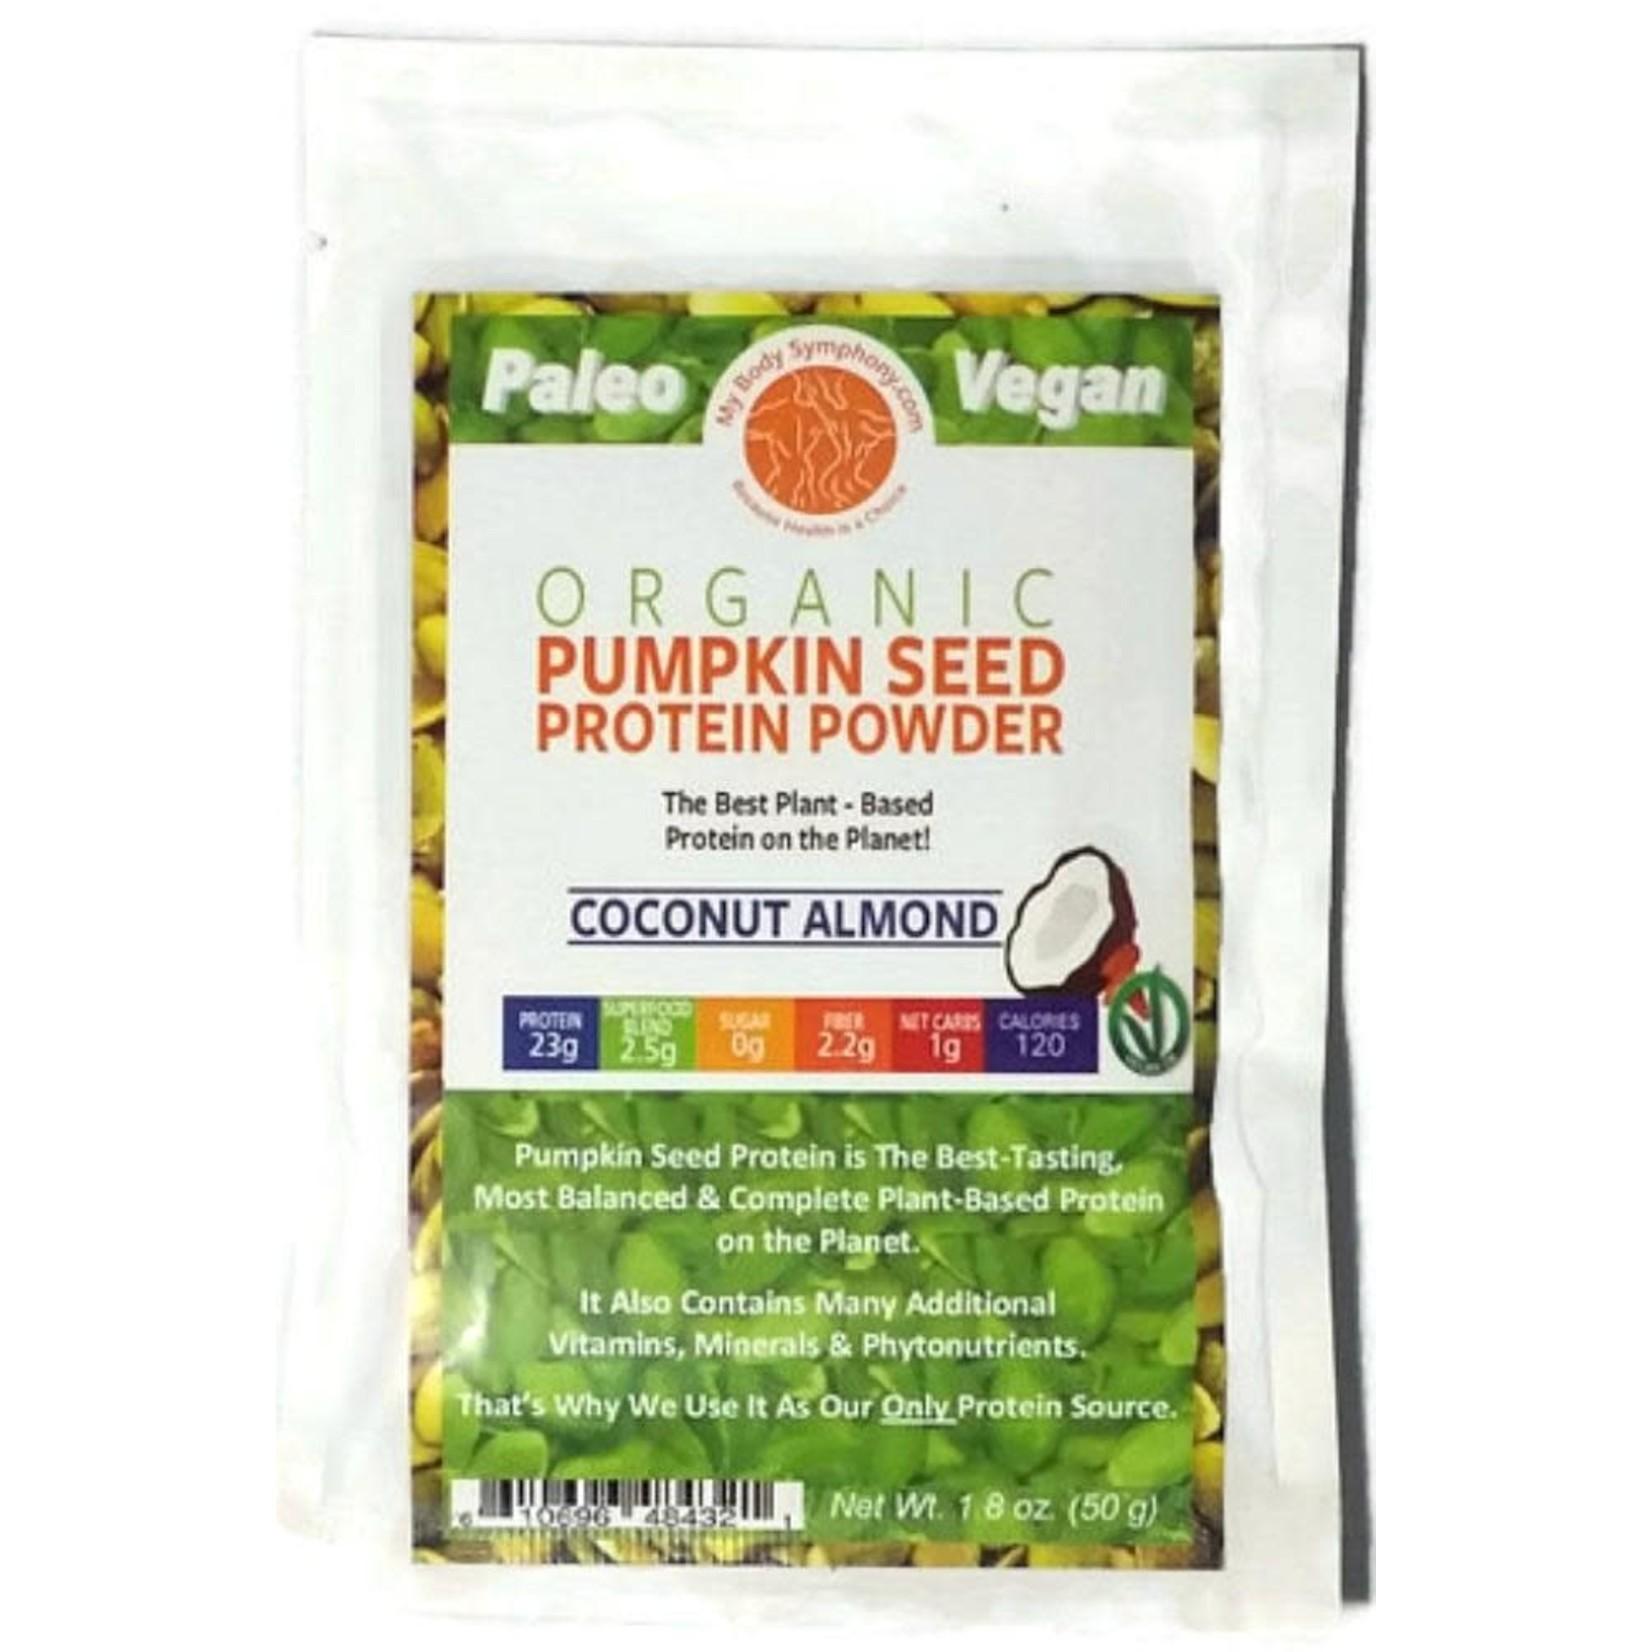 Body Symphony Body Symphony Pumpkin Seed Protein 1.8oz